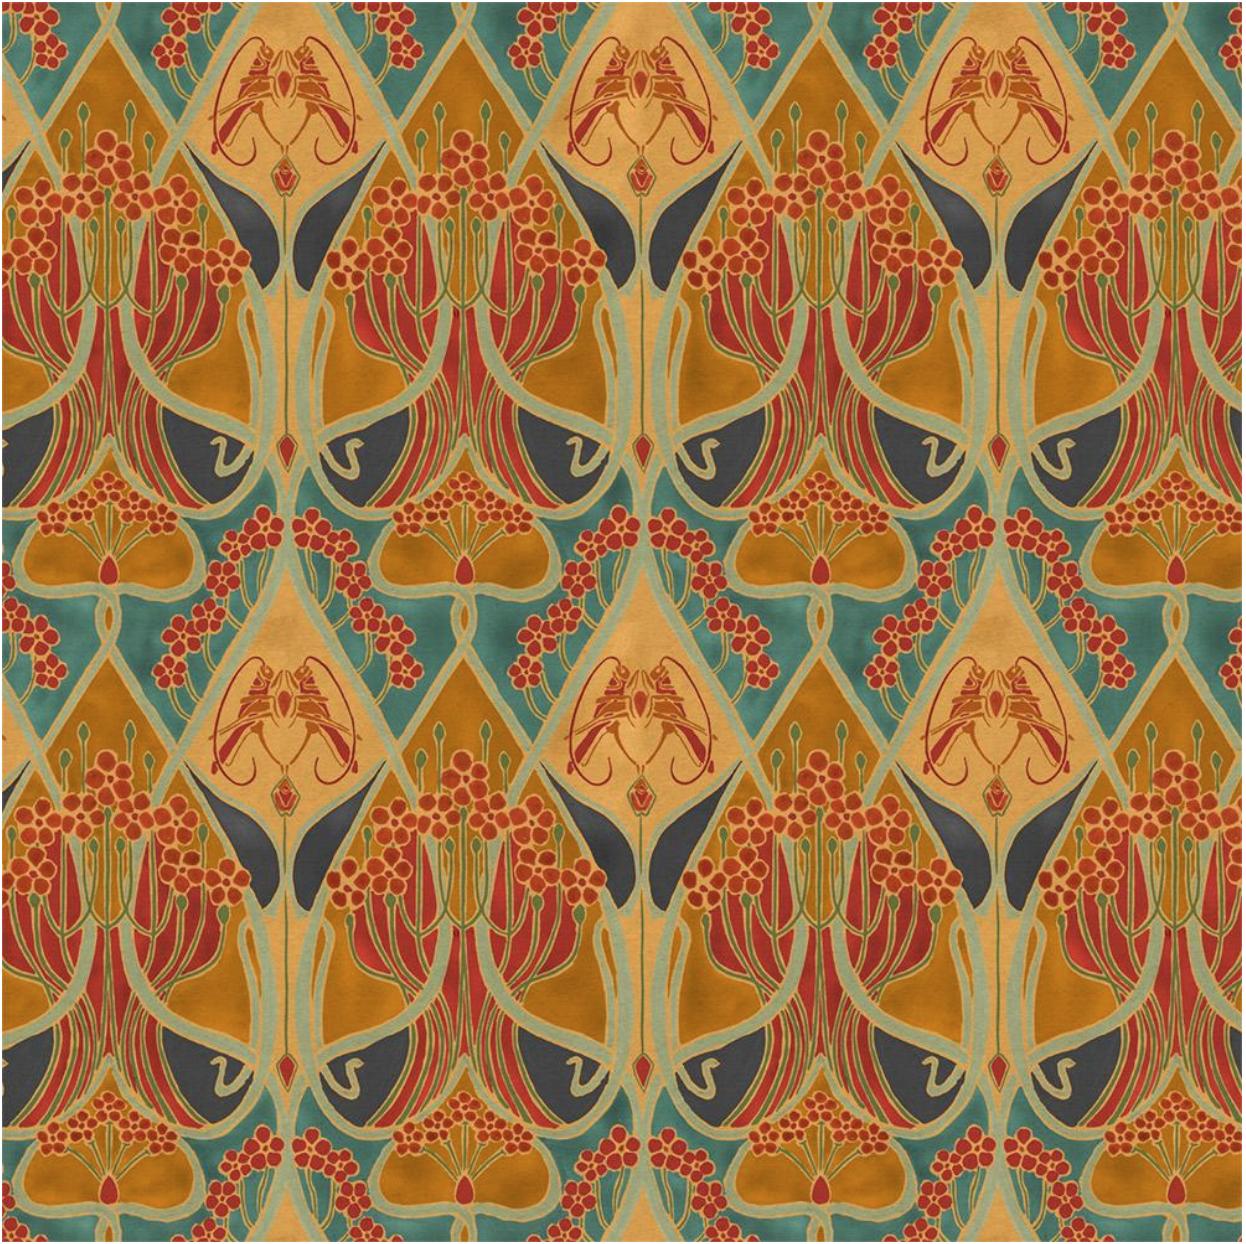 Vintageinspired wall covering from Astek Art nouveau